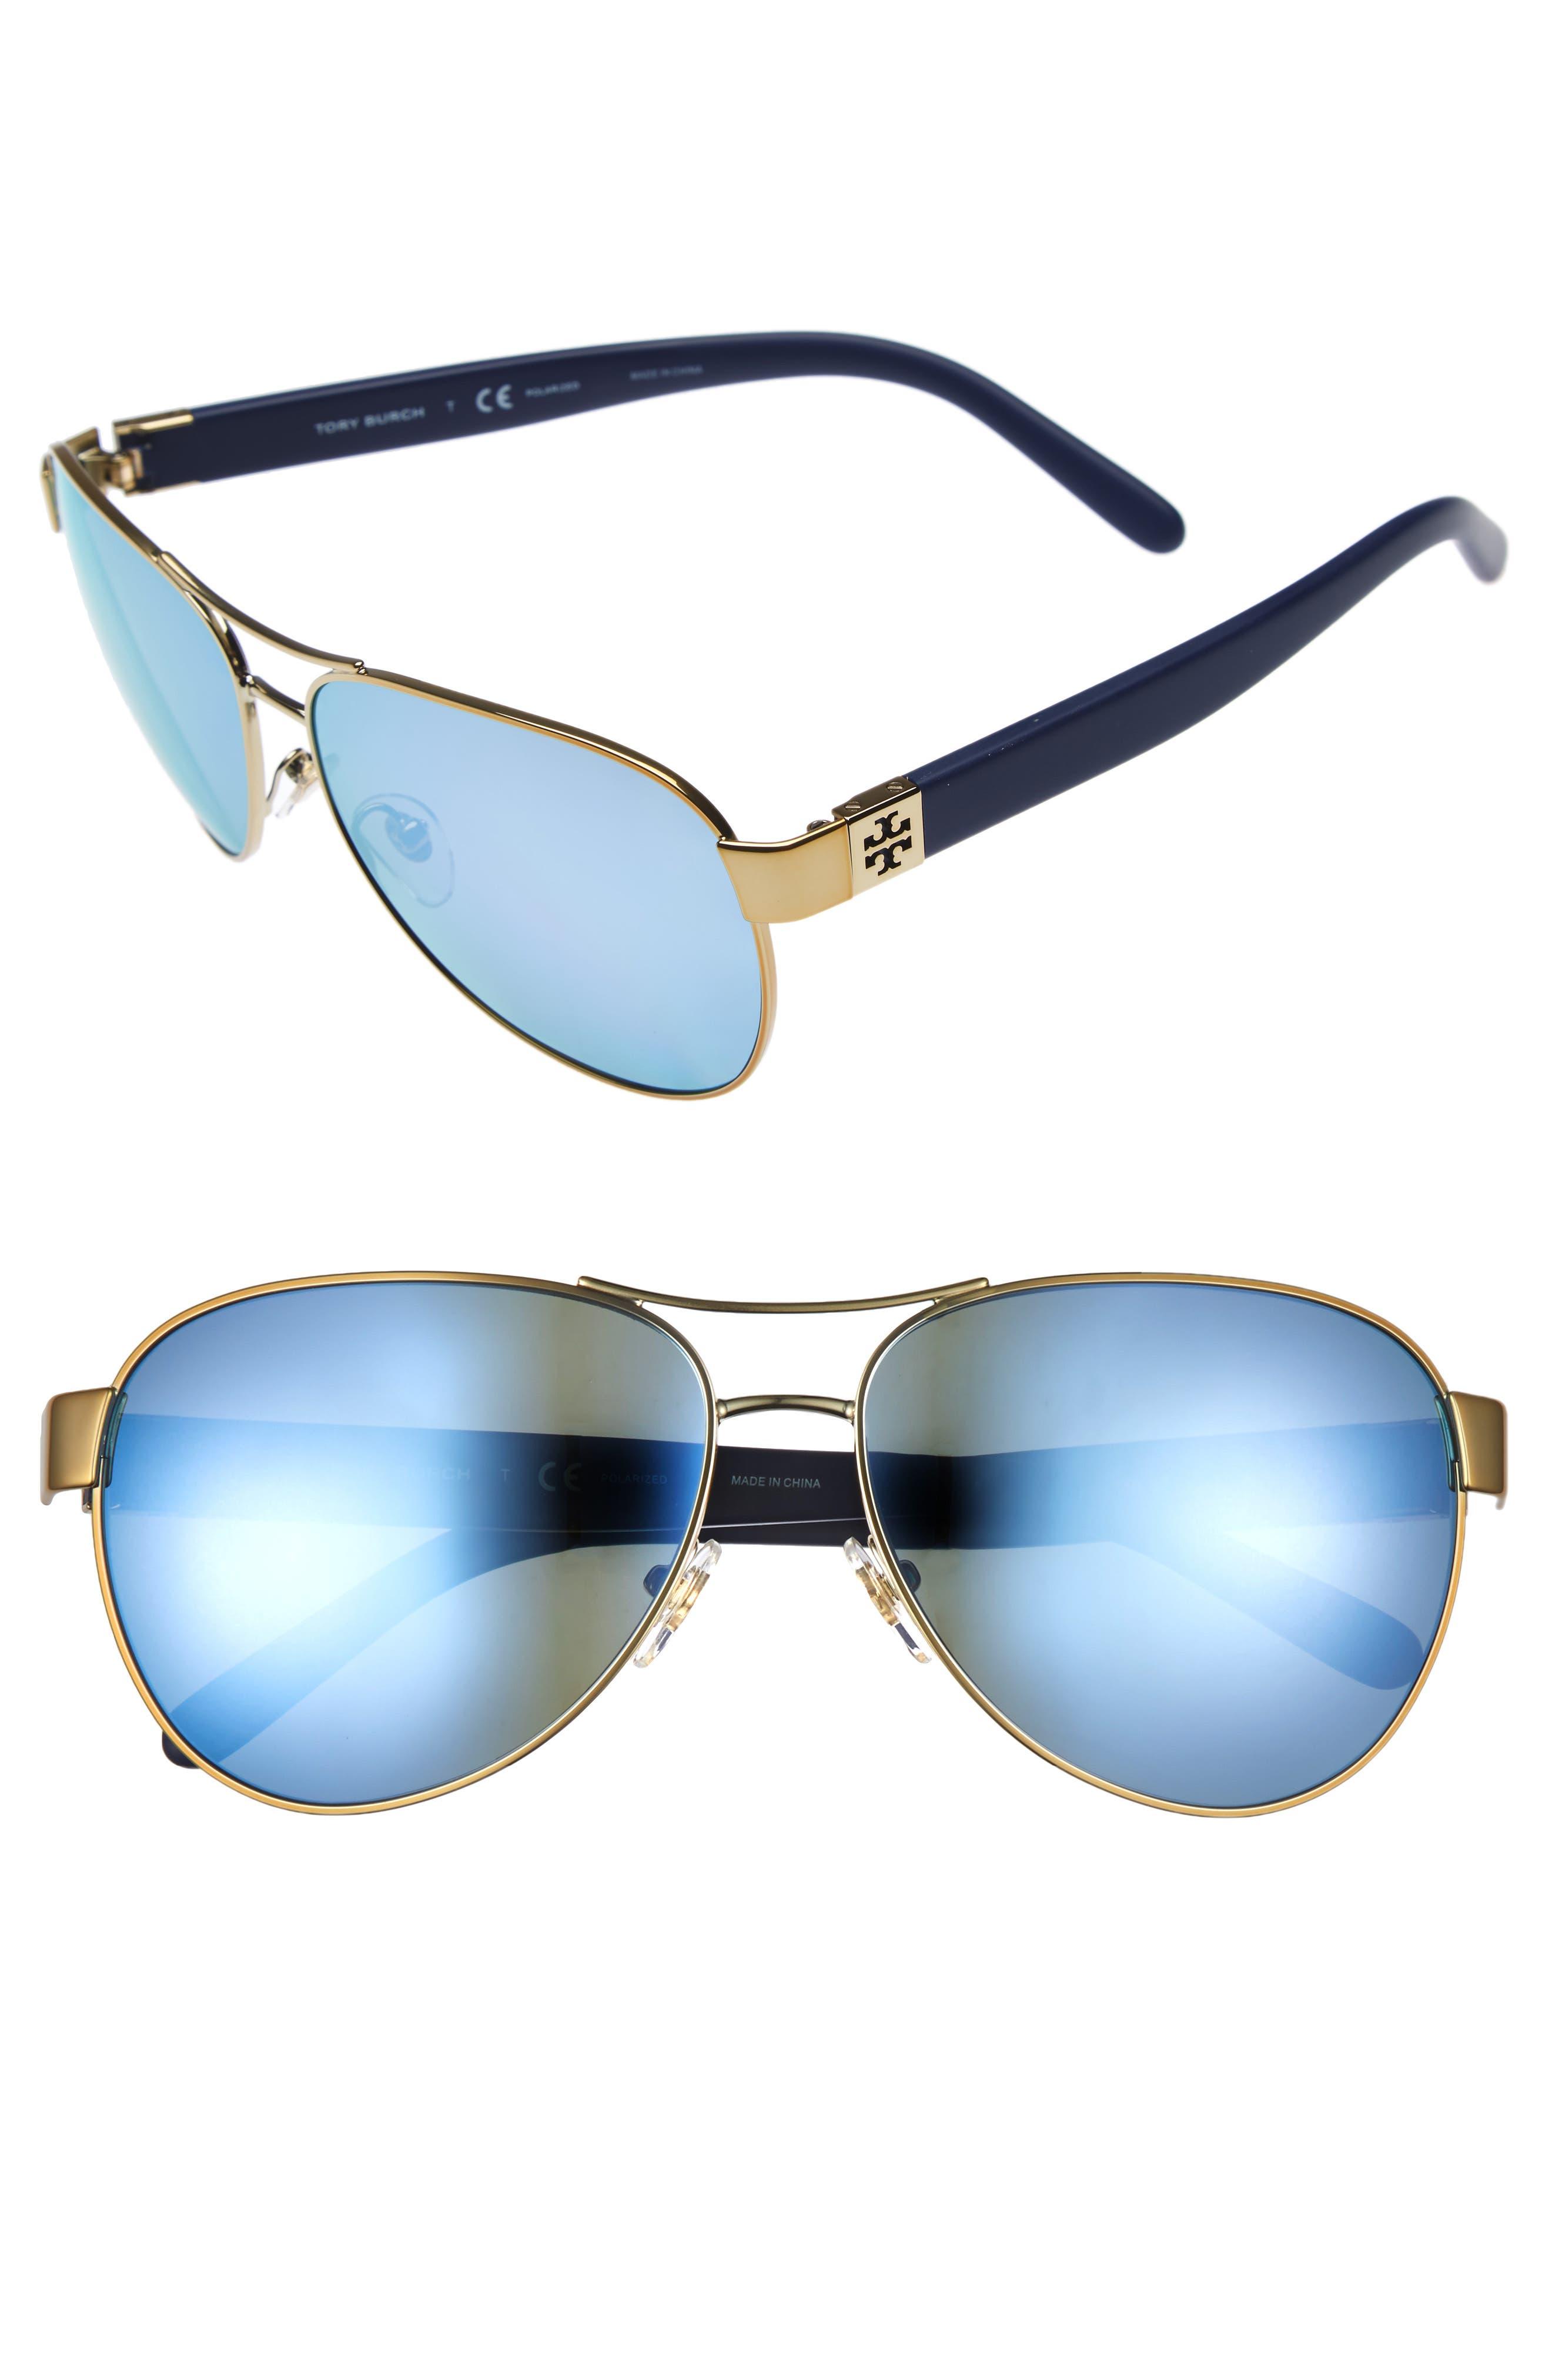 Main Image - Tory Burch 60mm Polarized Aviator Sunglasses